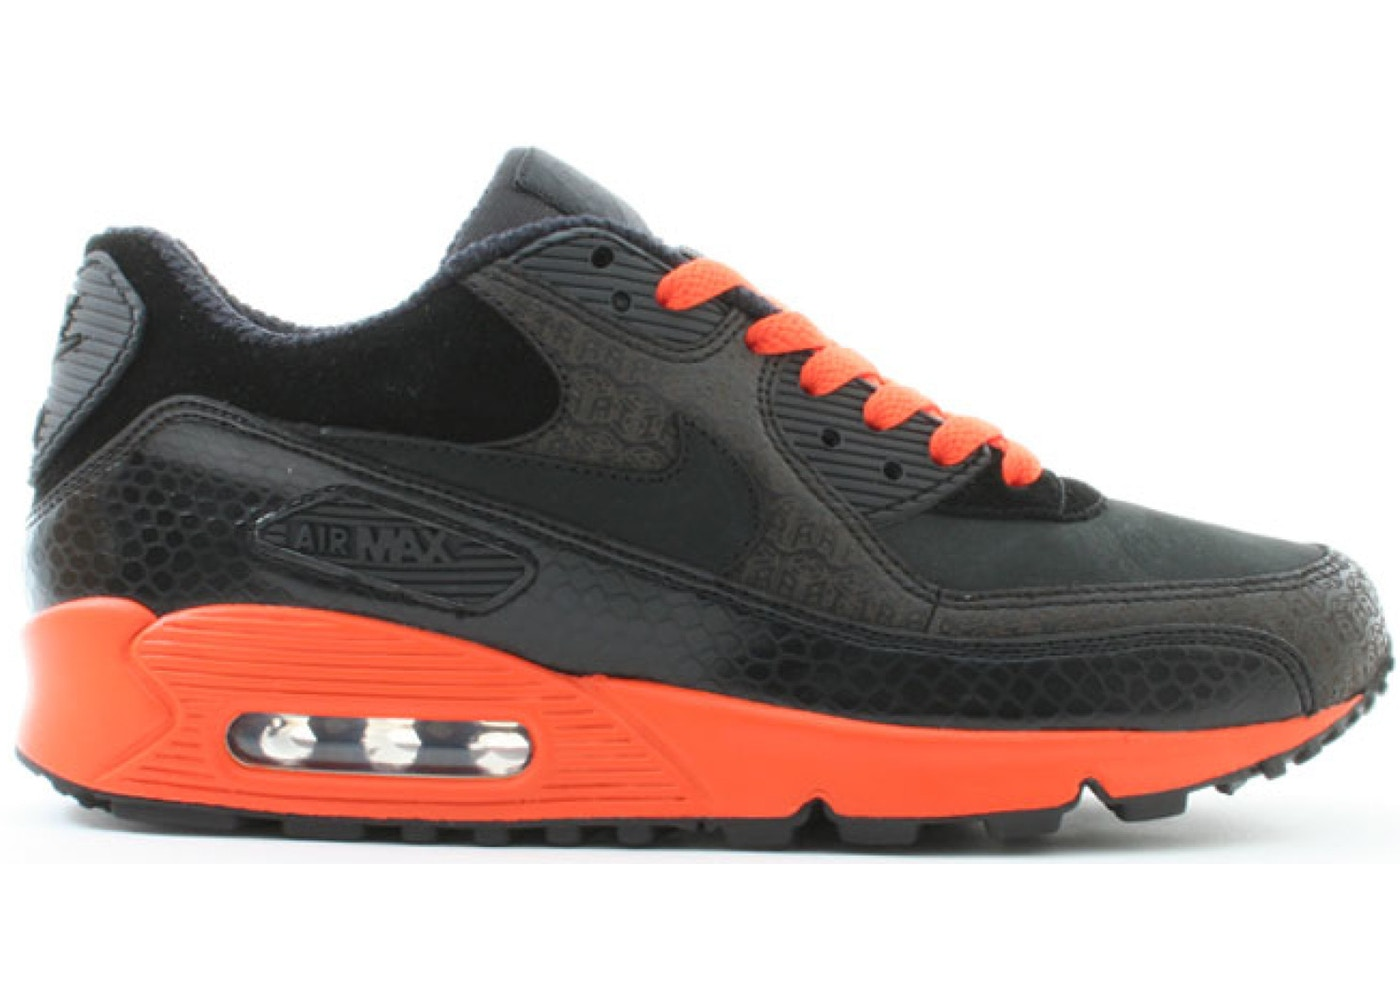 Nike Air Max 90 Powerwall Black Orange